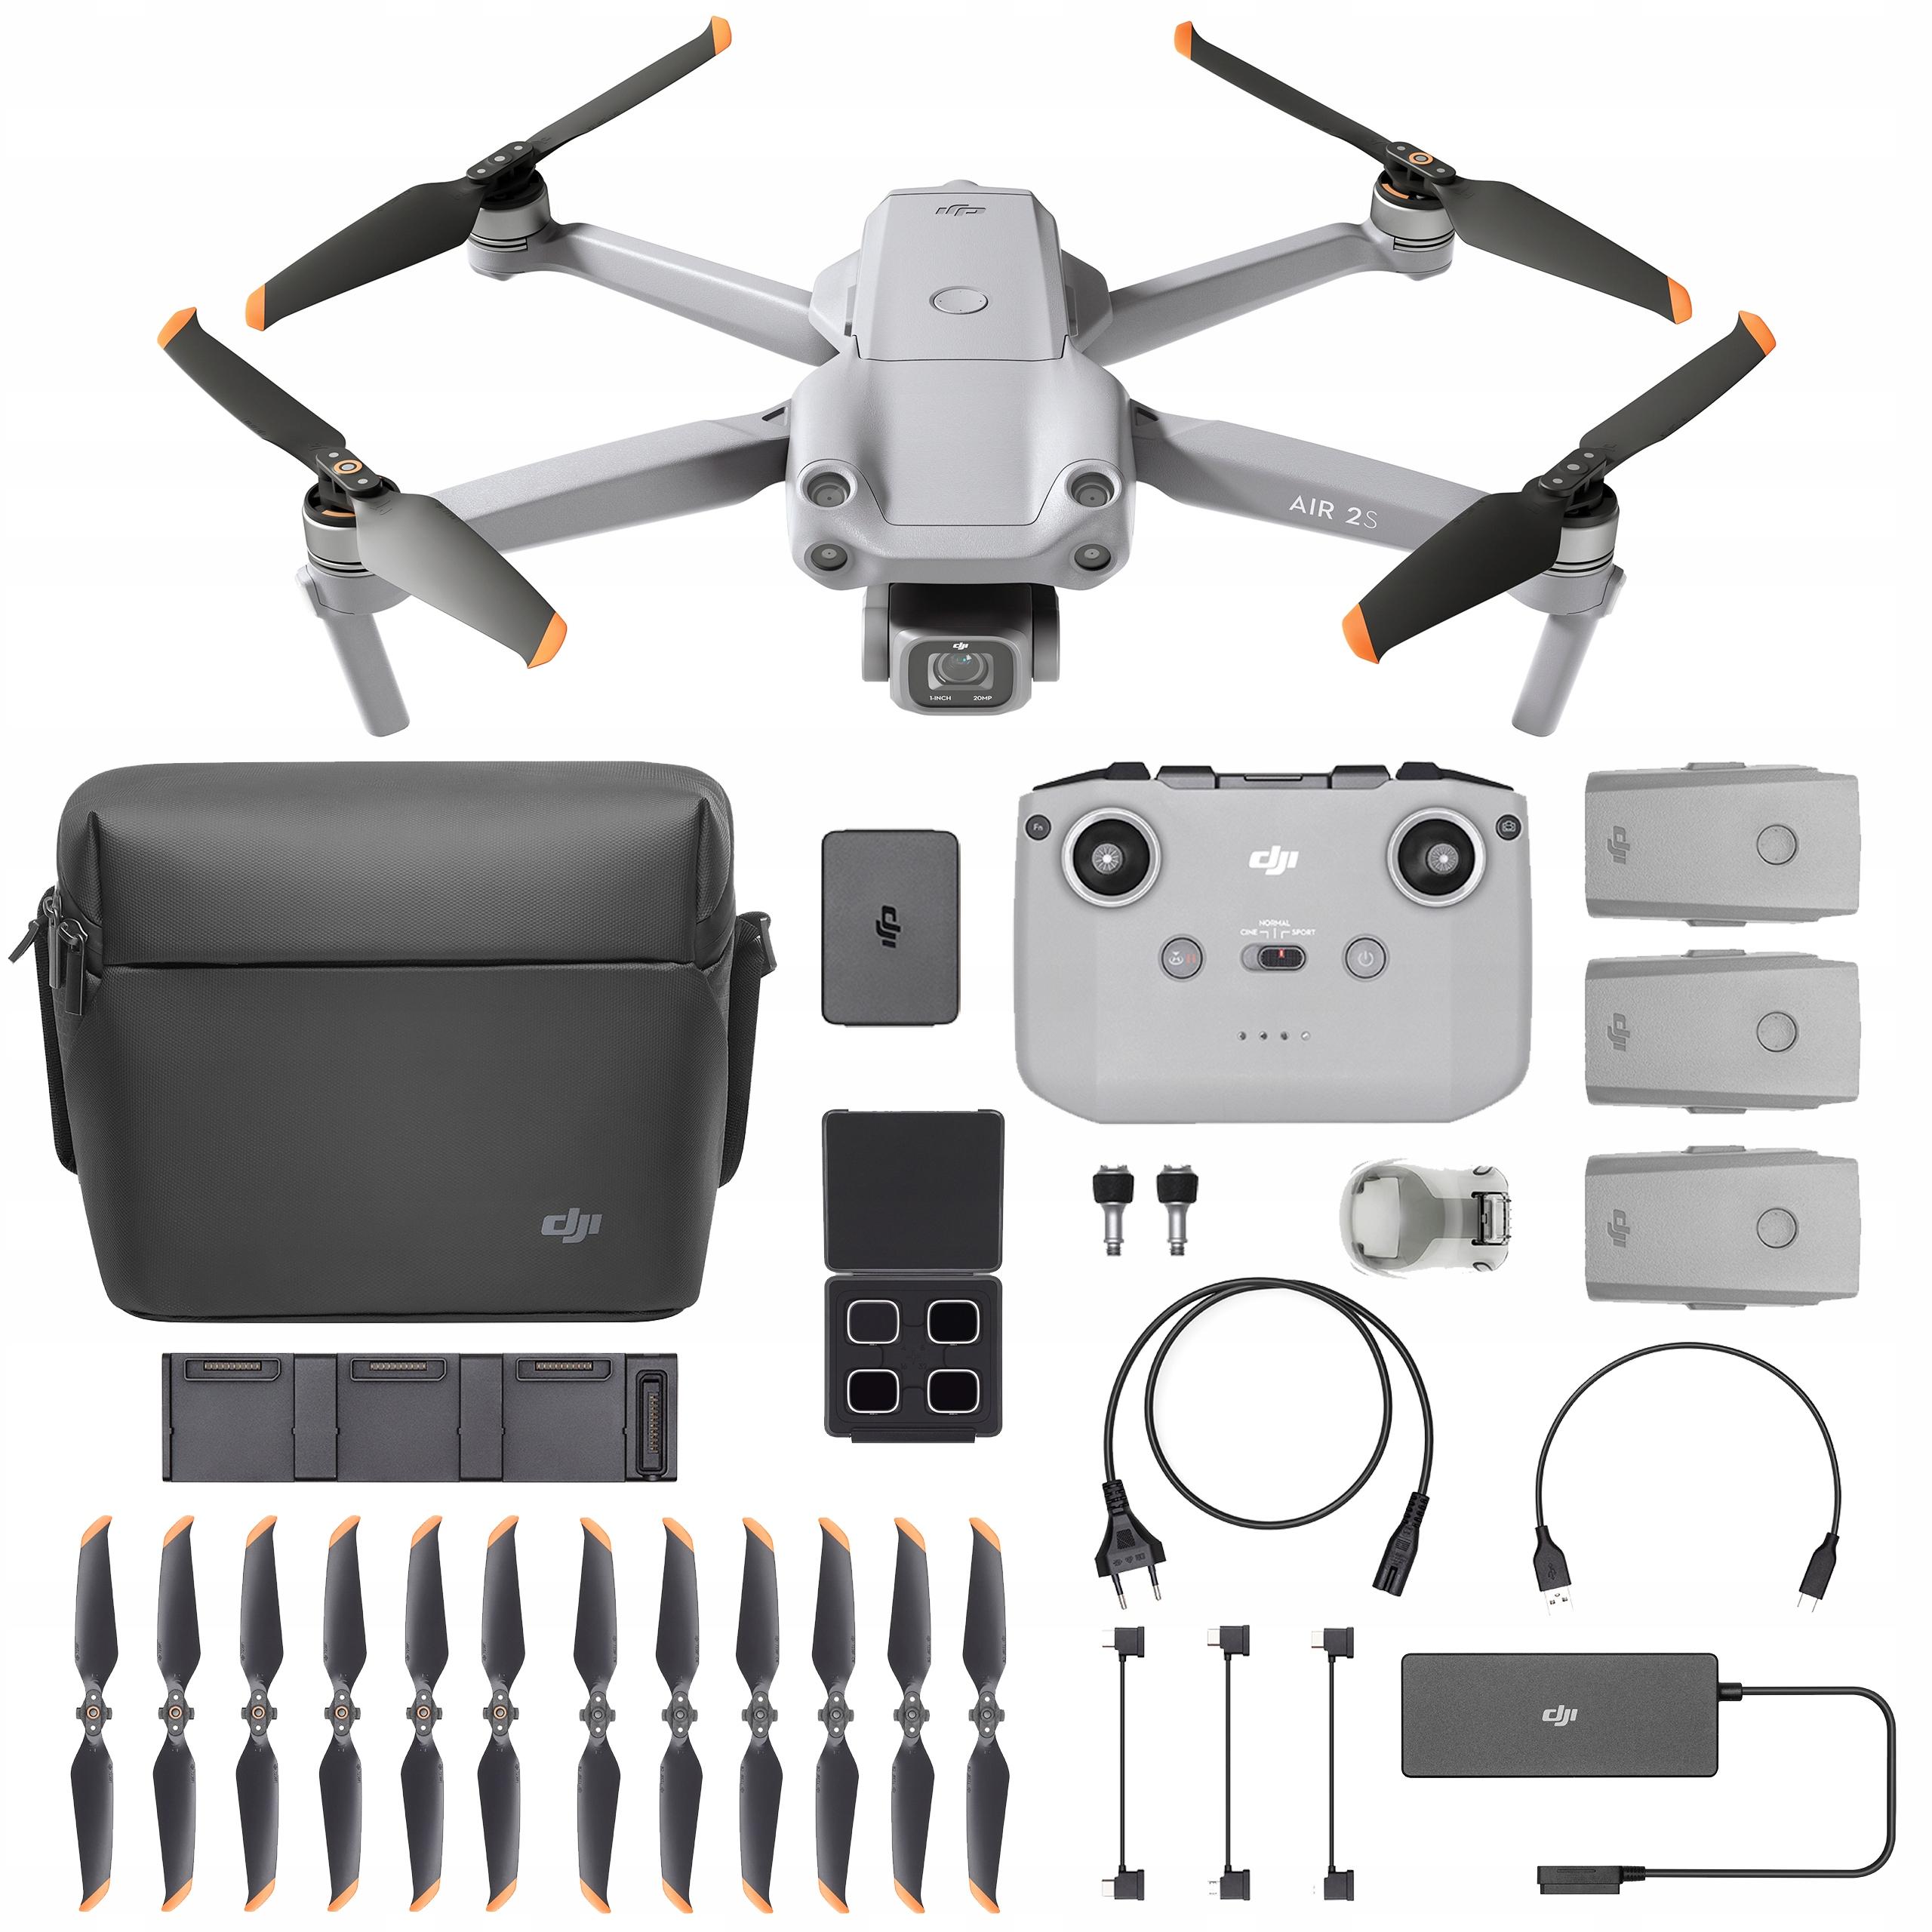 Комбинированный дрон DJI Air 2S (Mavic Air 2S) 5.4K 20MP